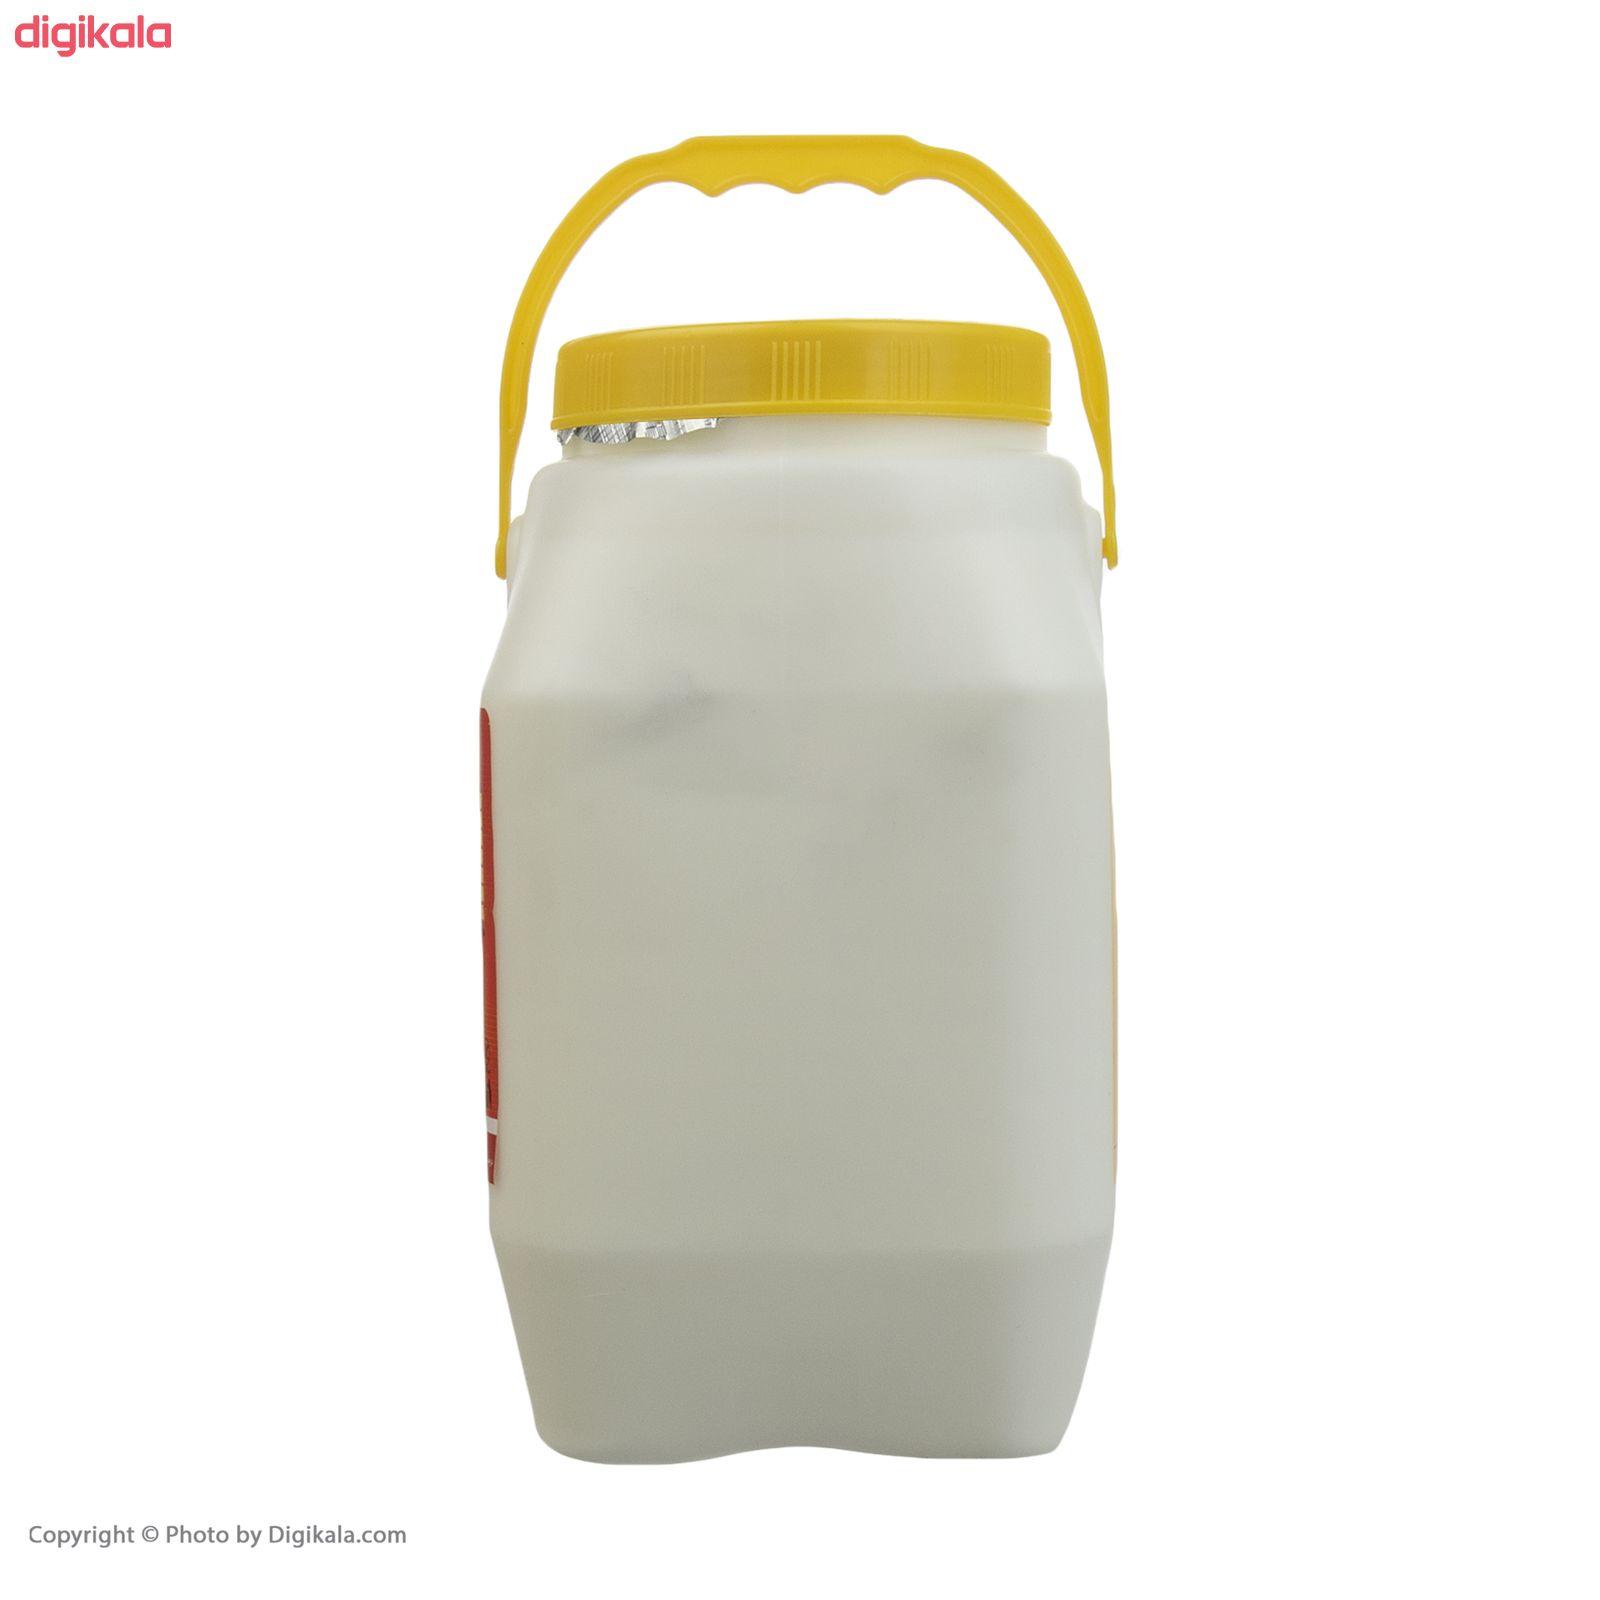 ماست سون پر چرب کاله مقدار 2.2 کیلوگرم main 1 6